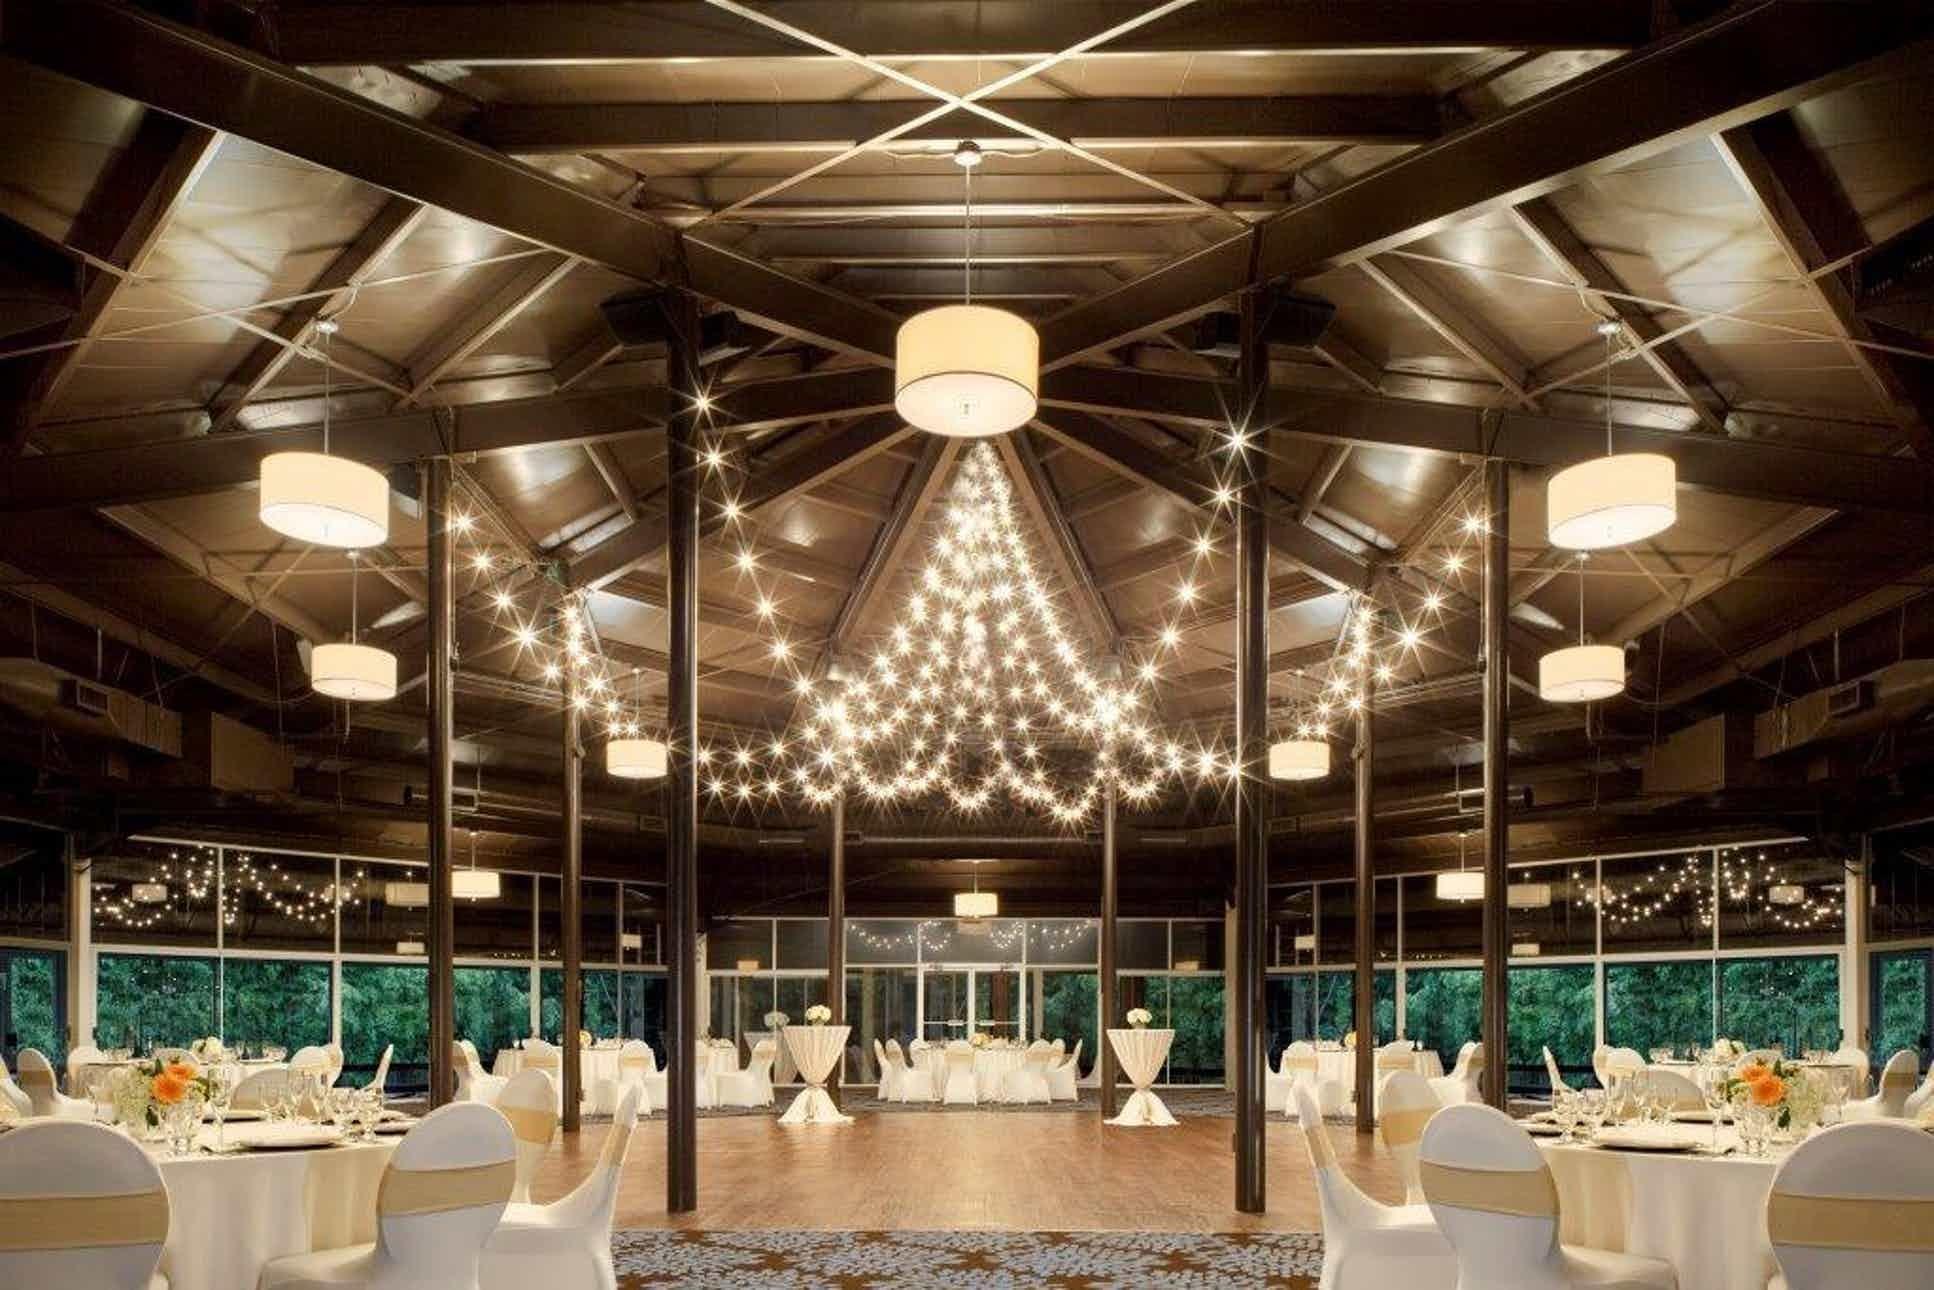 Sheraton Arlington Hotel Dallas Ft. Worth Weddings Texas ...